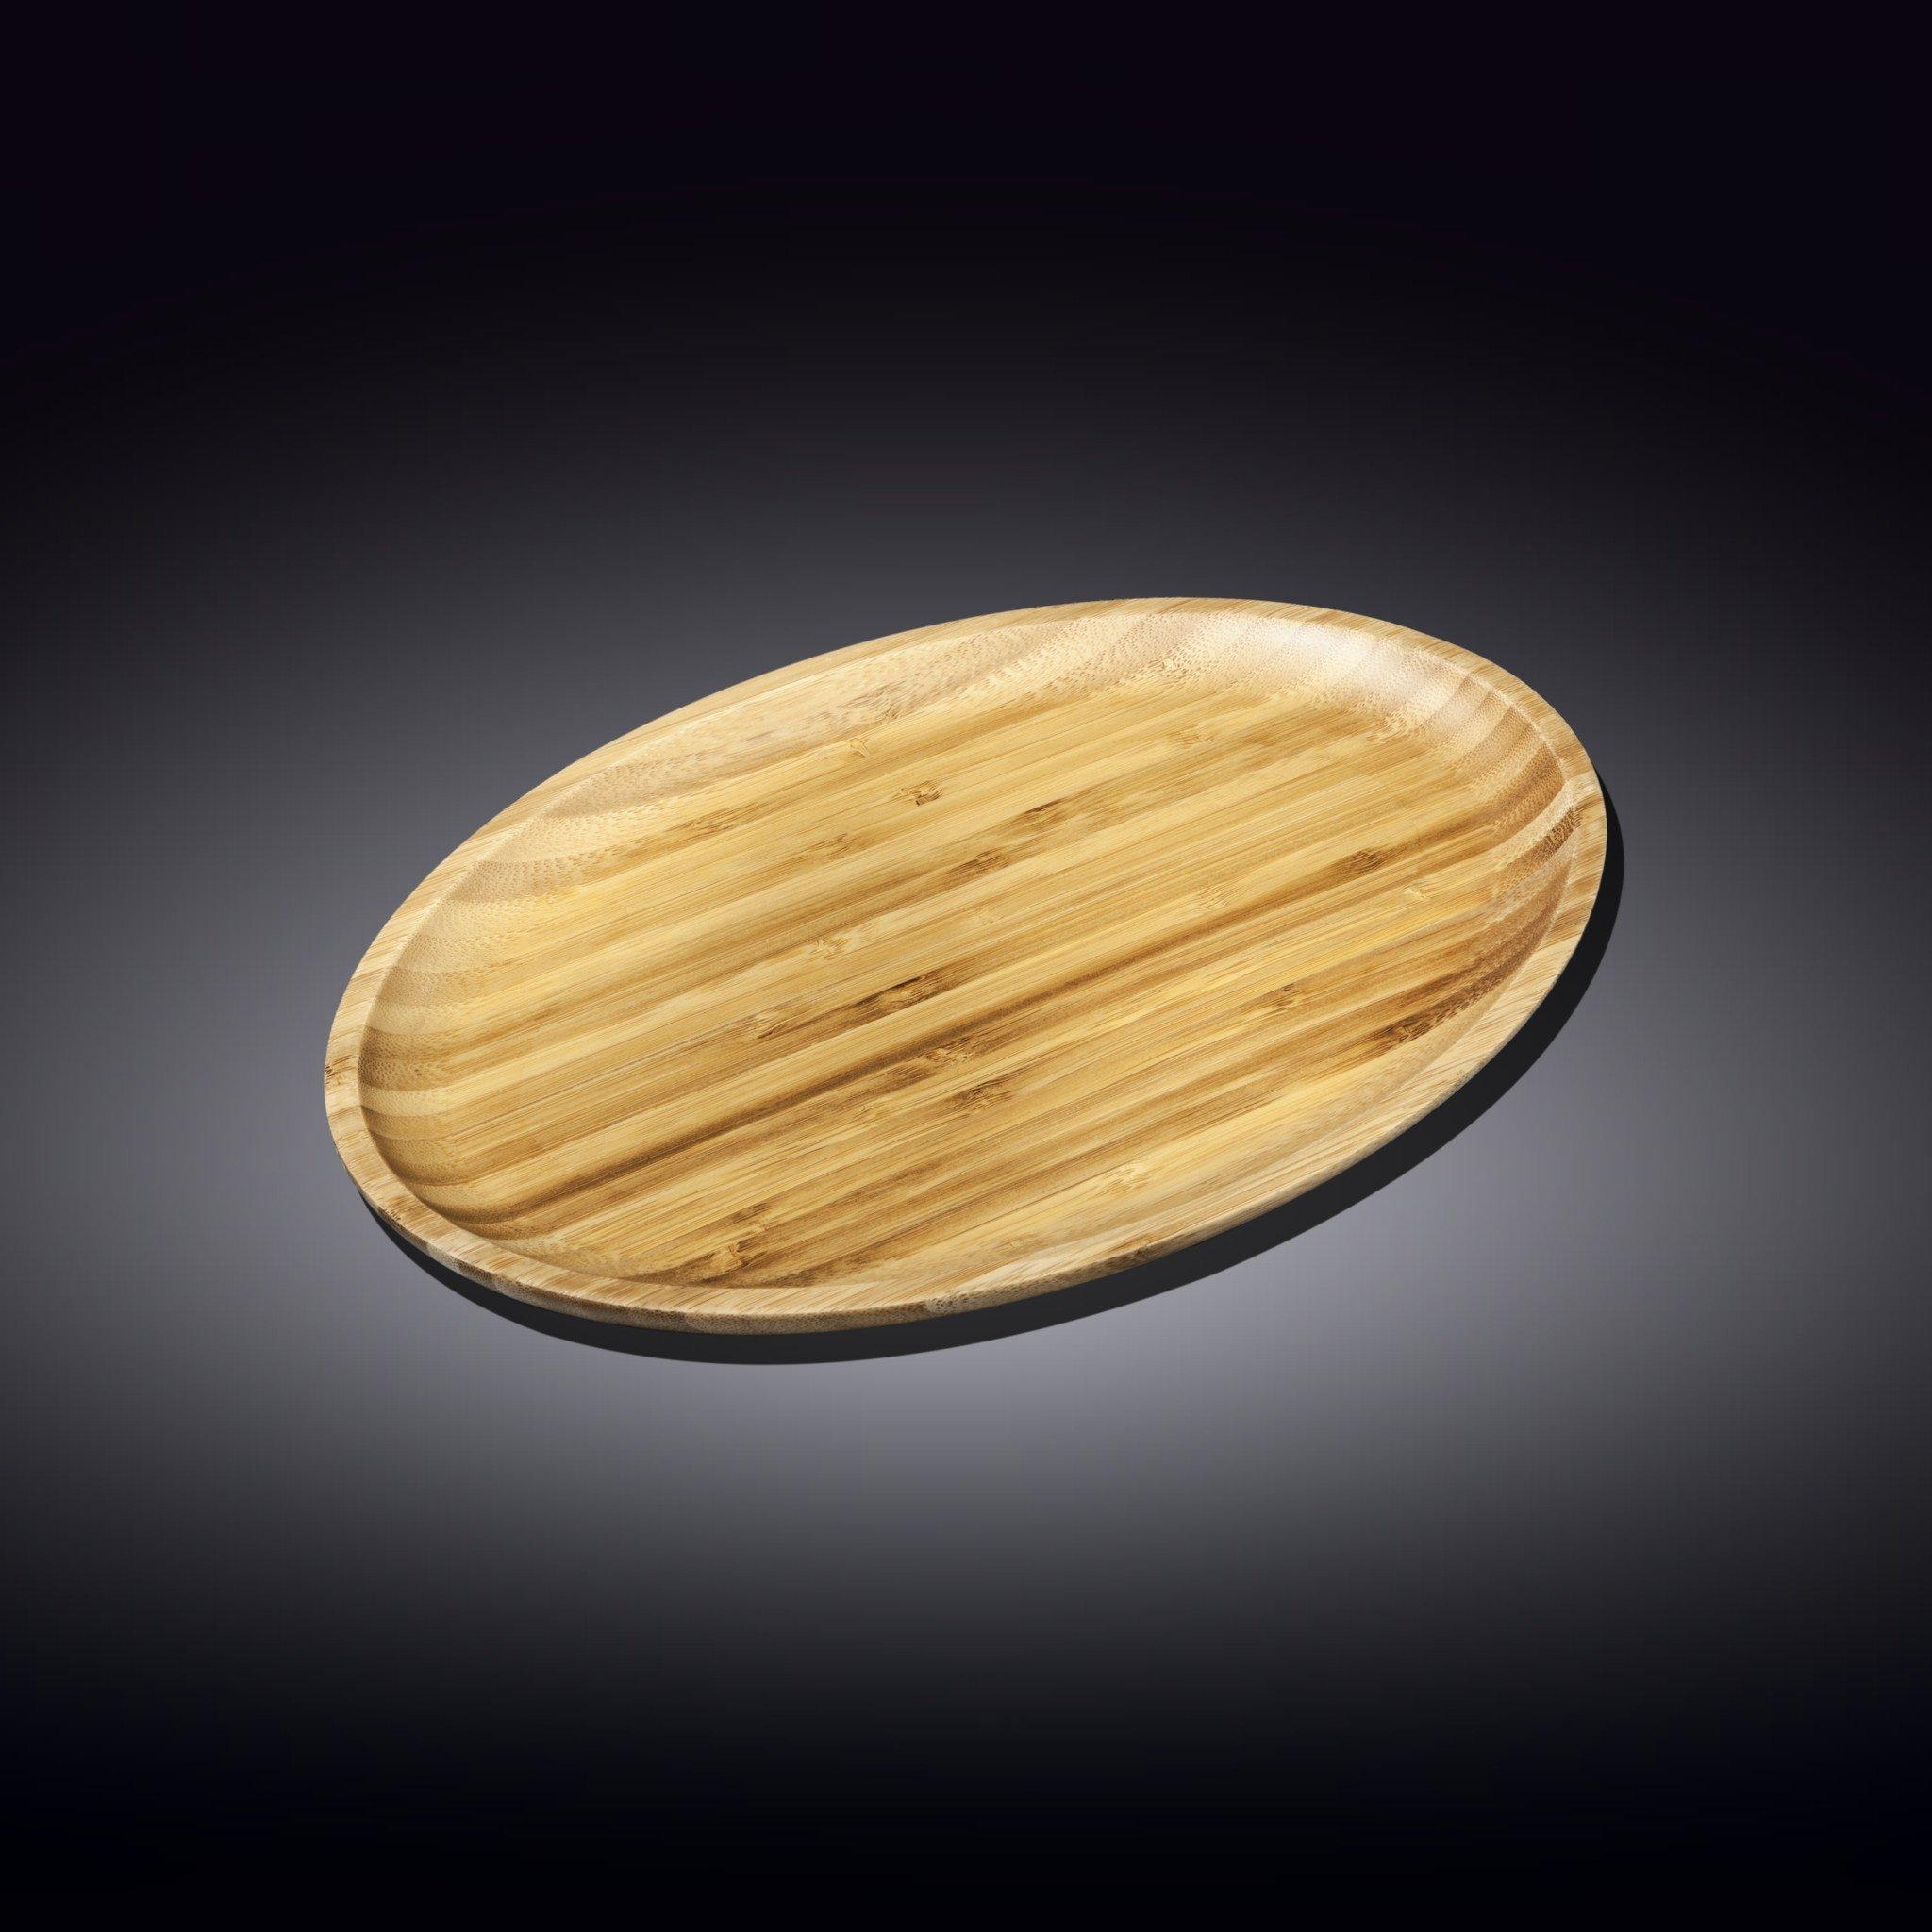 Блюдо 25.5*16.5см Бамбук Wilmax овальное